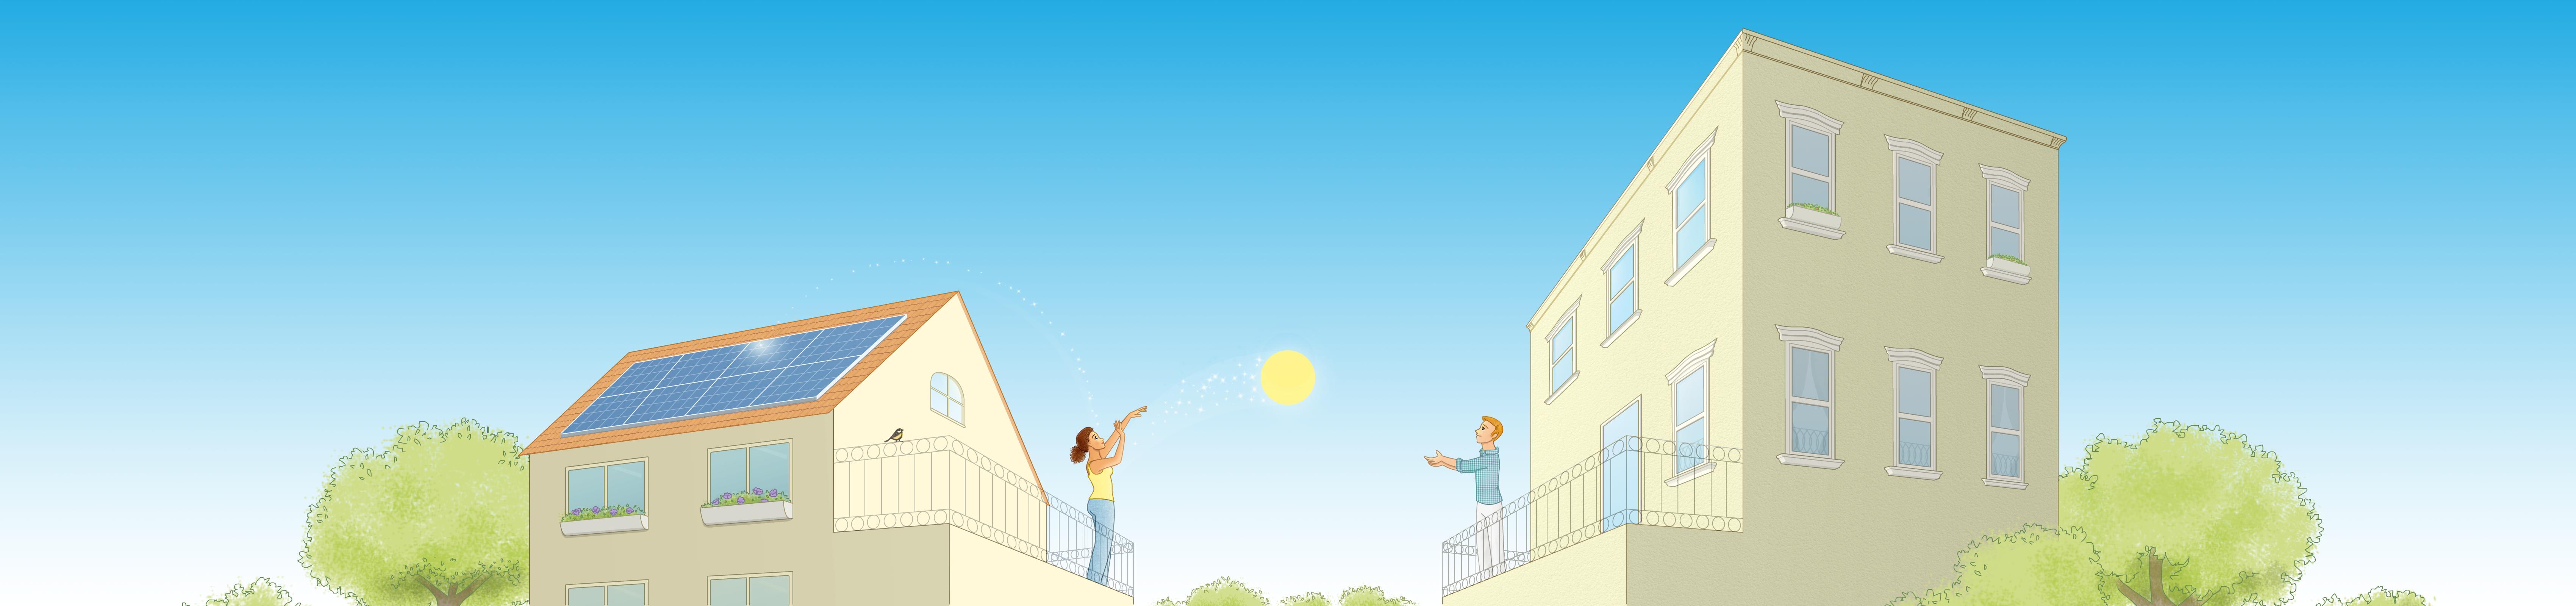 Yeloha solar sharing